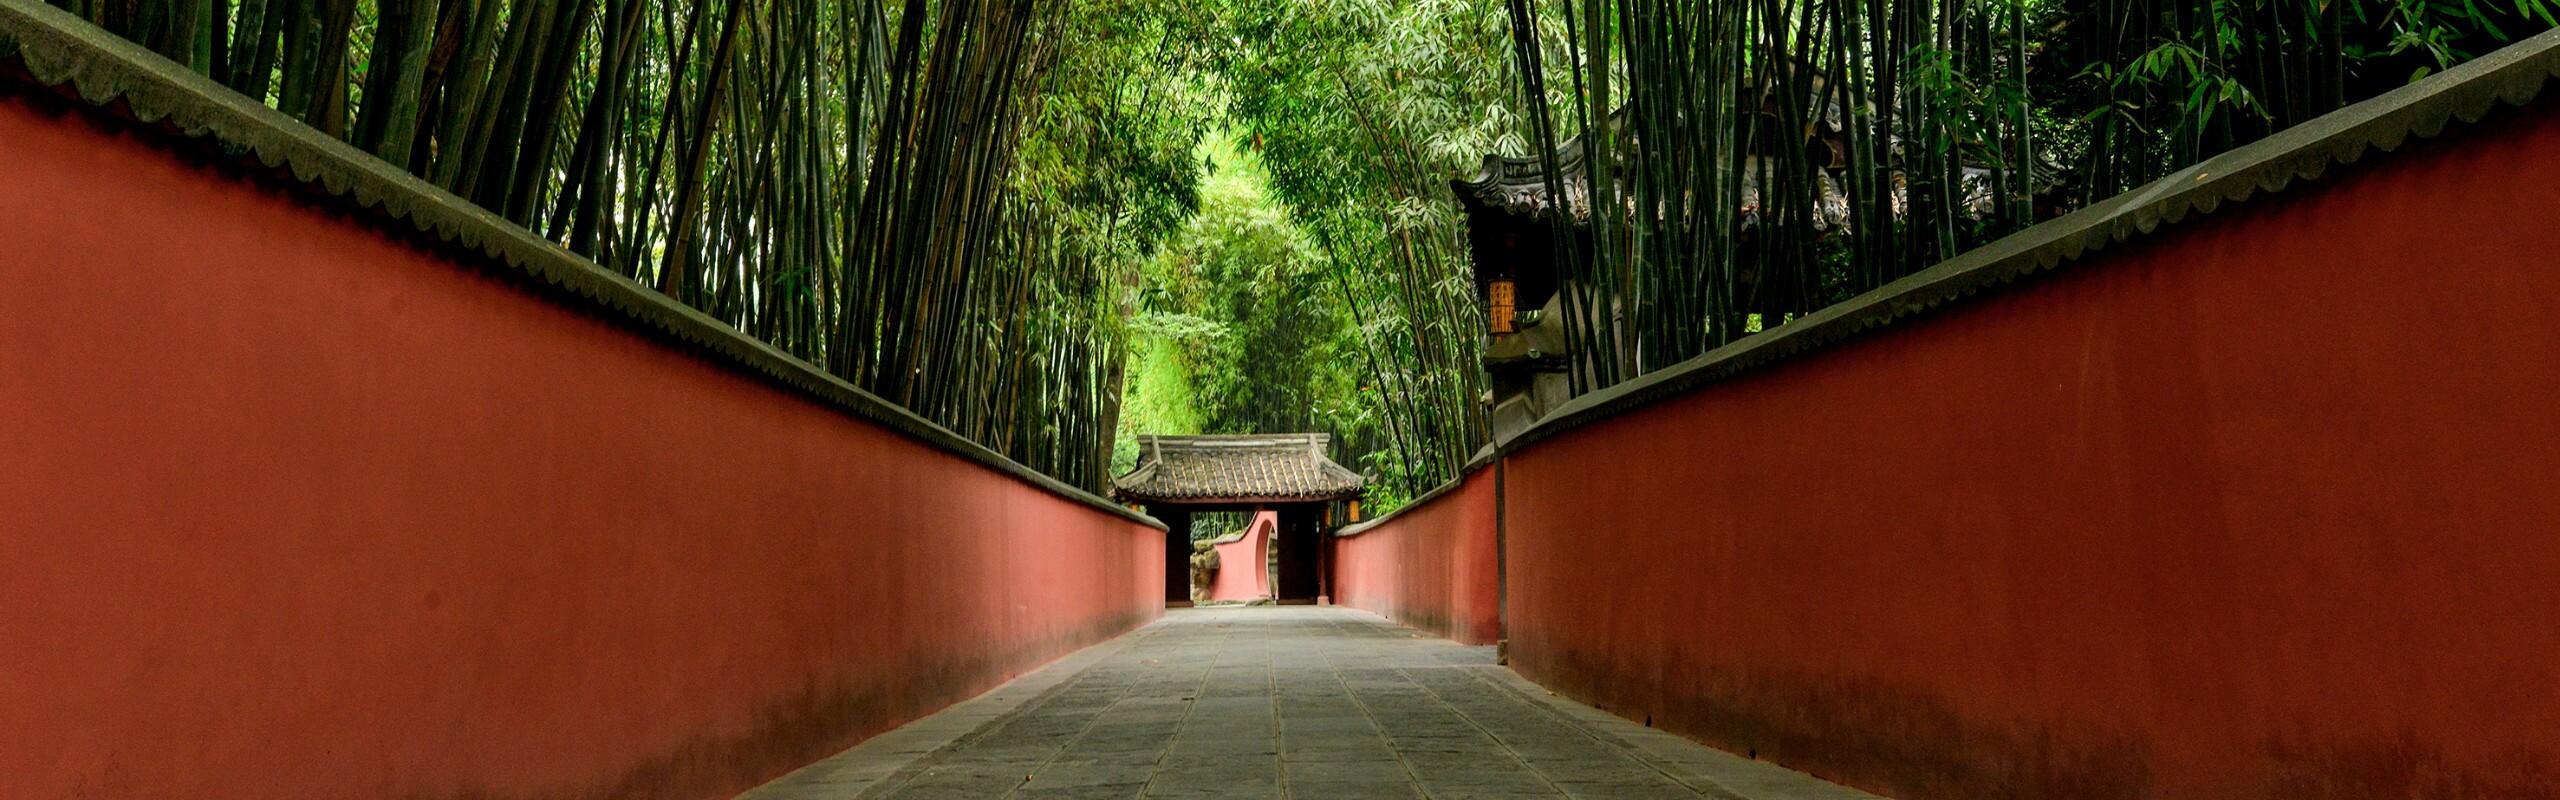 Chengdu Spotlight Experiences